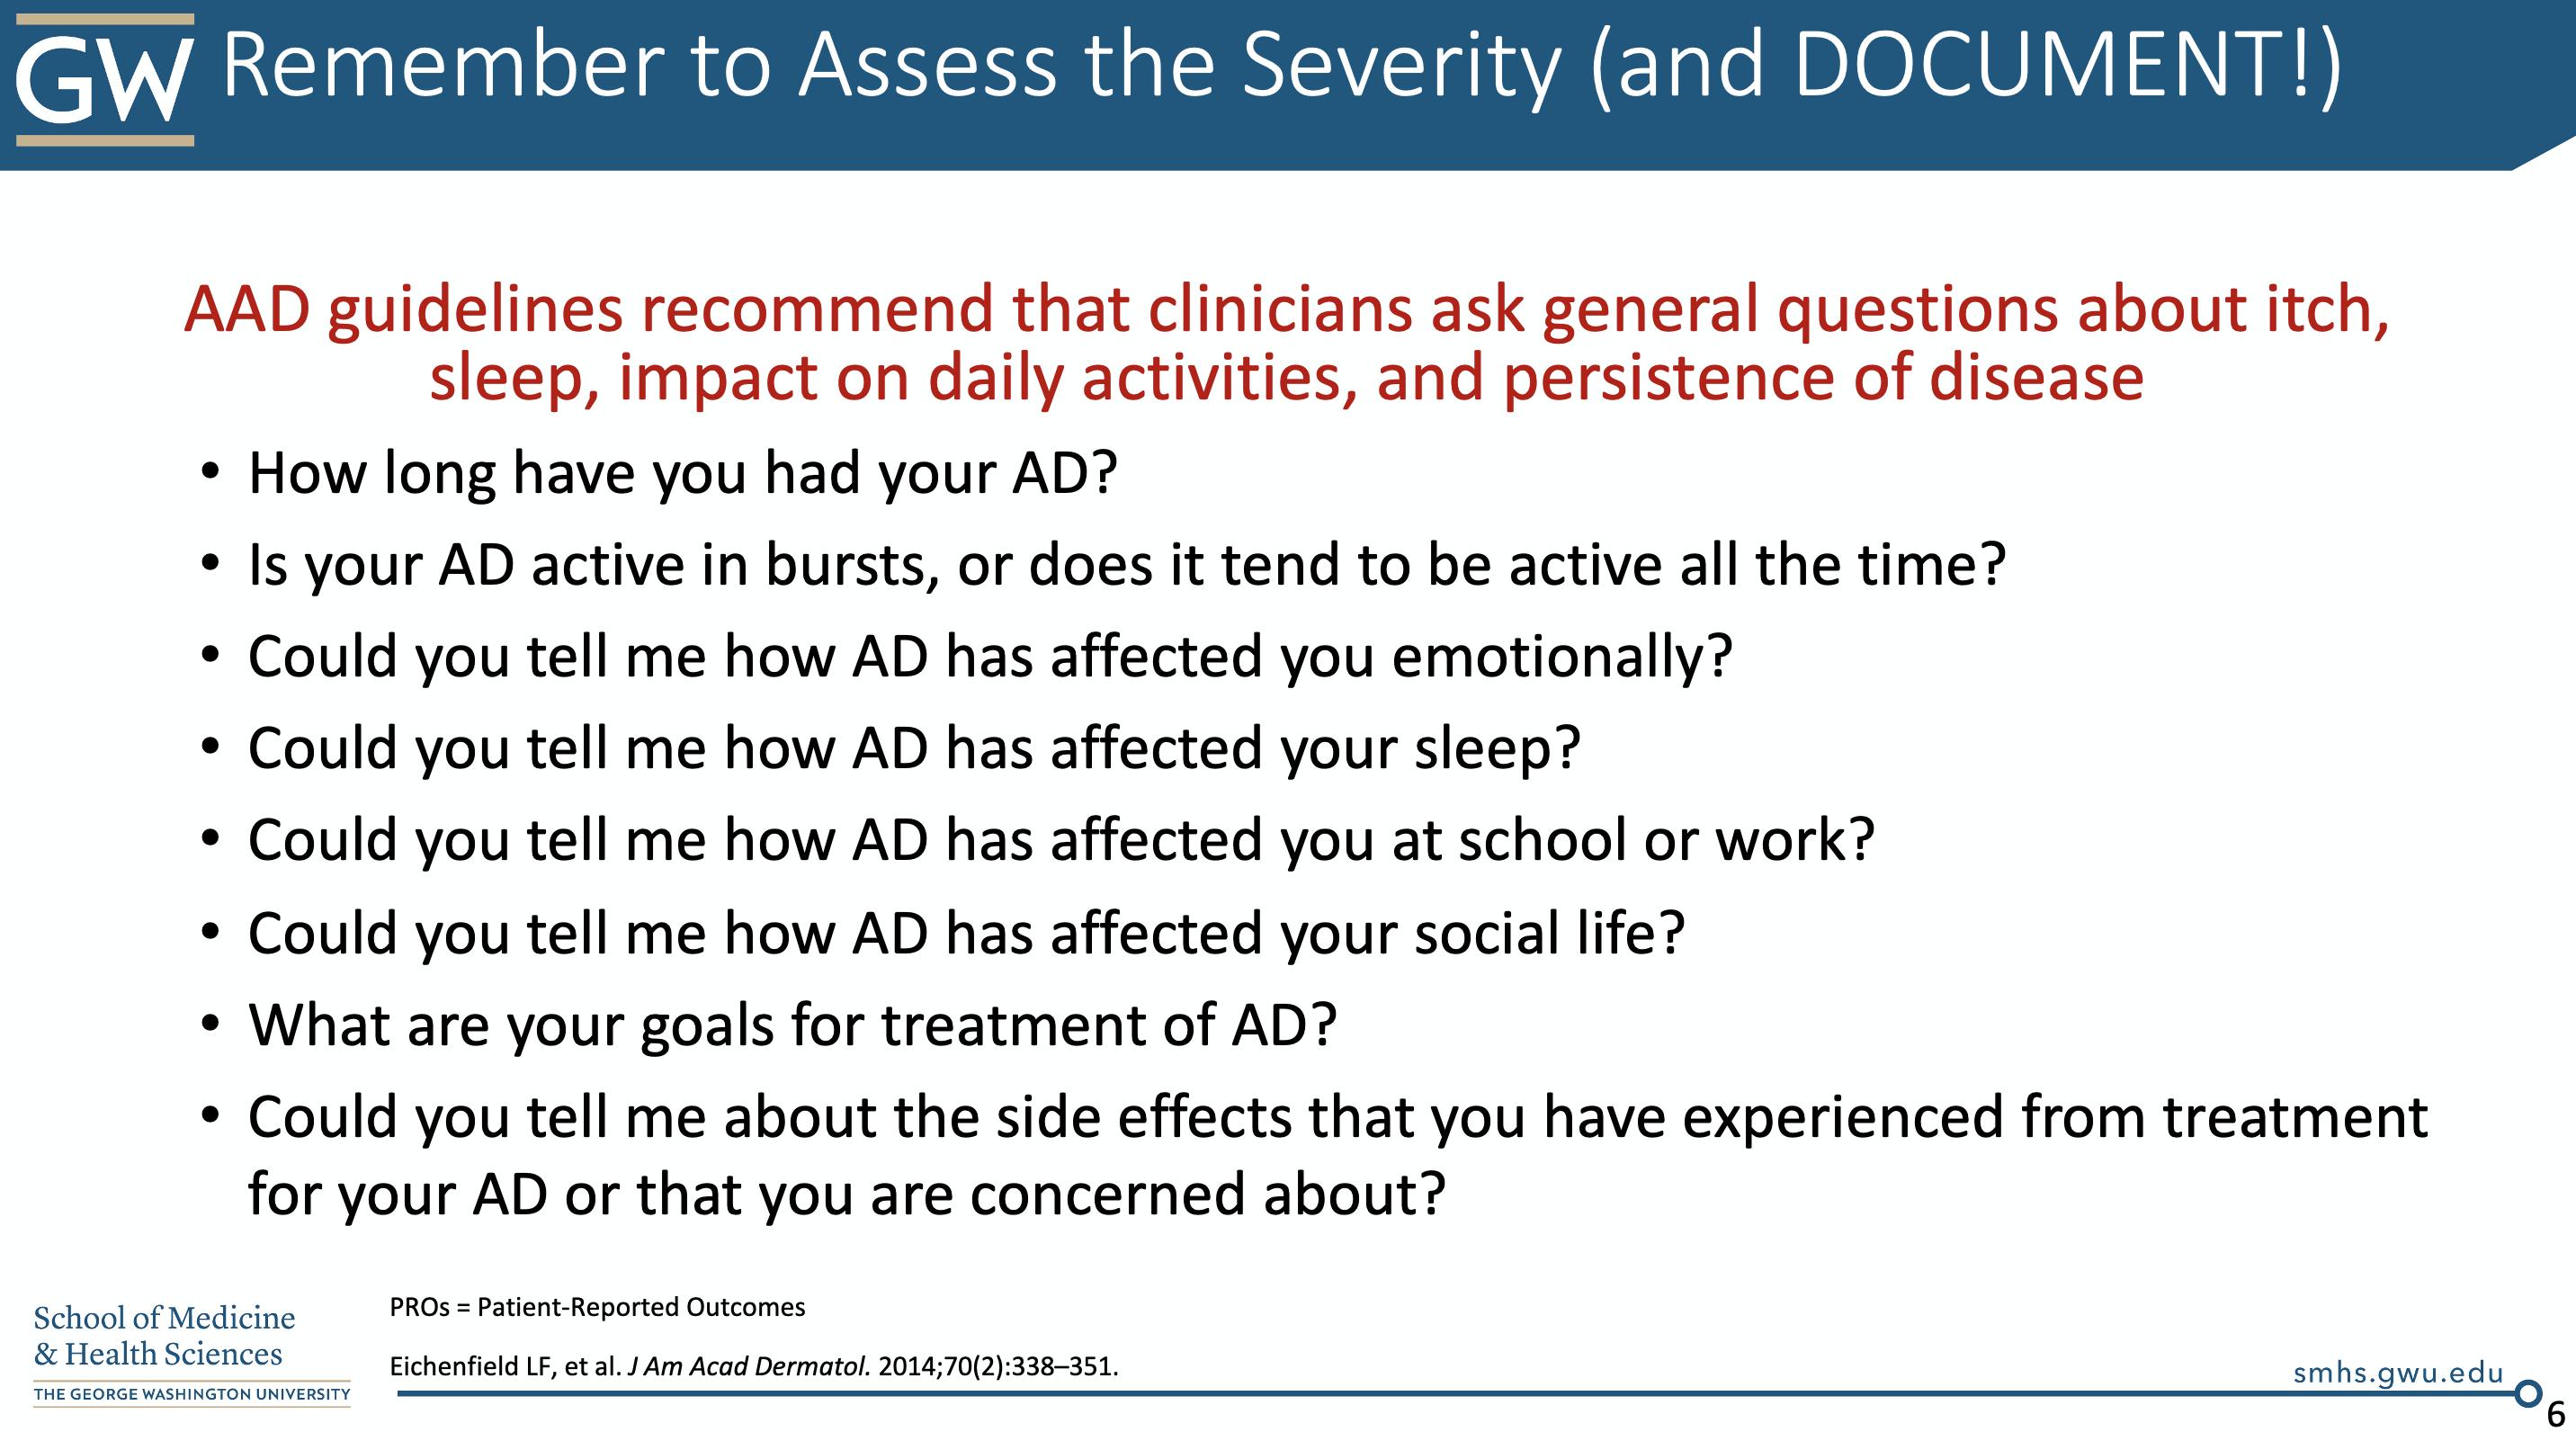 atopic dermatitis questionnaire